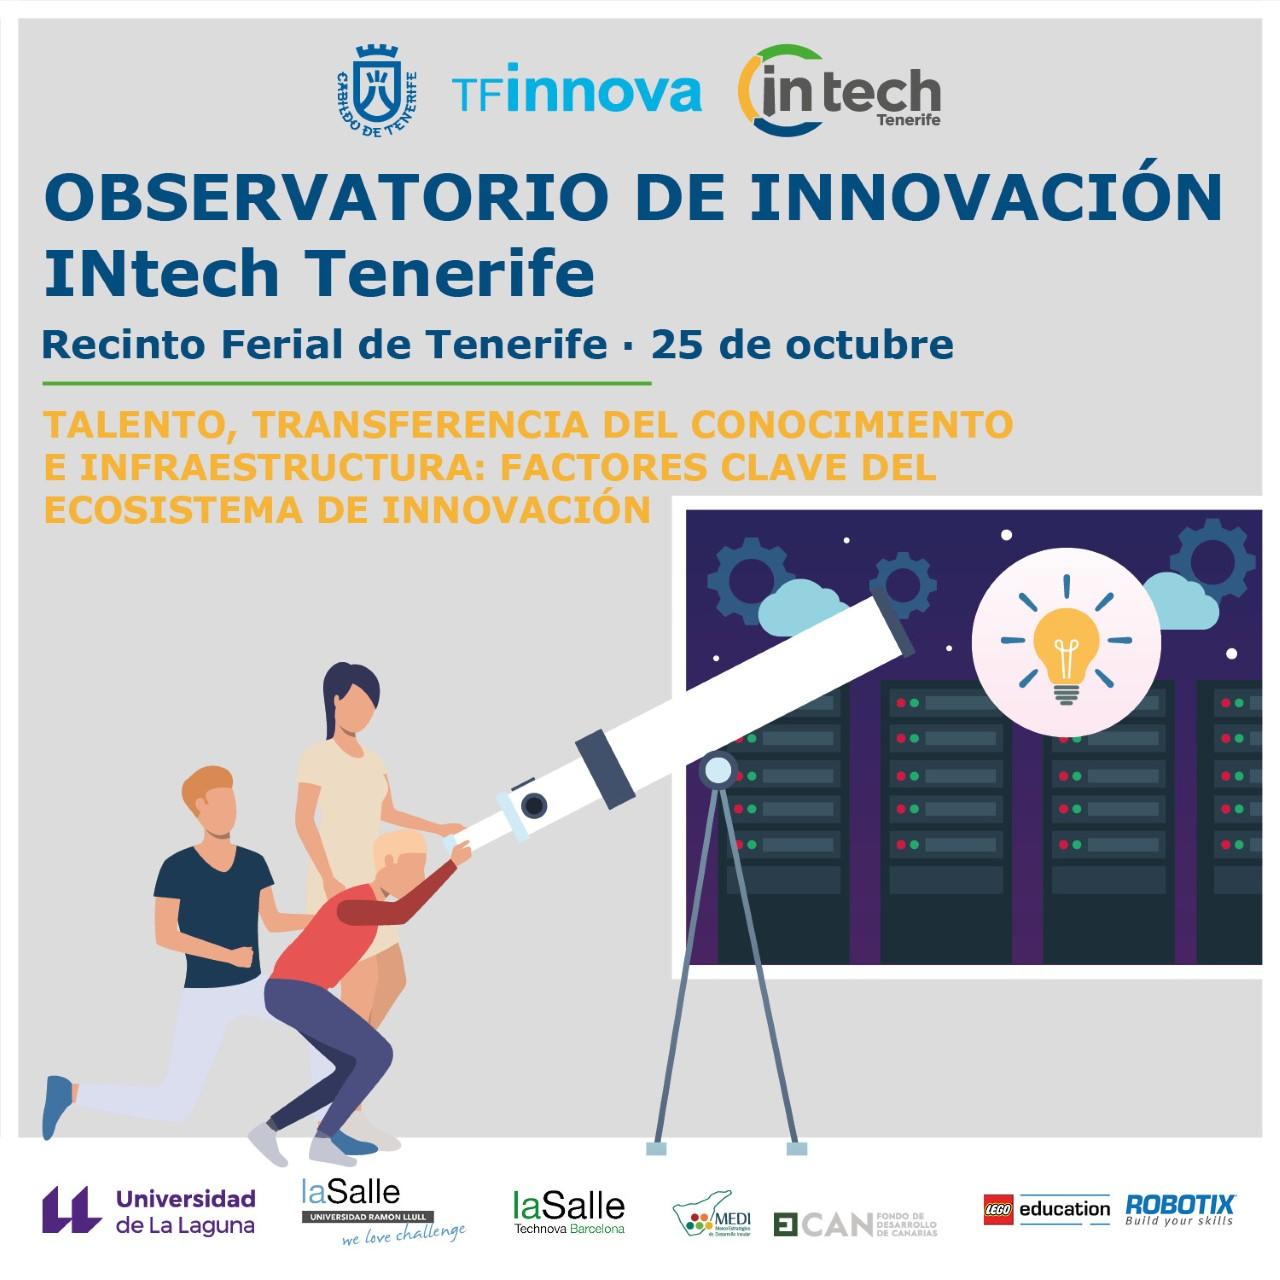 Observatorio de Innovacion